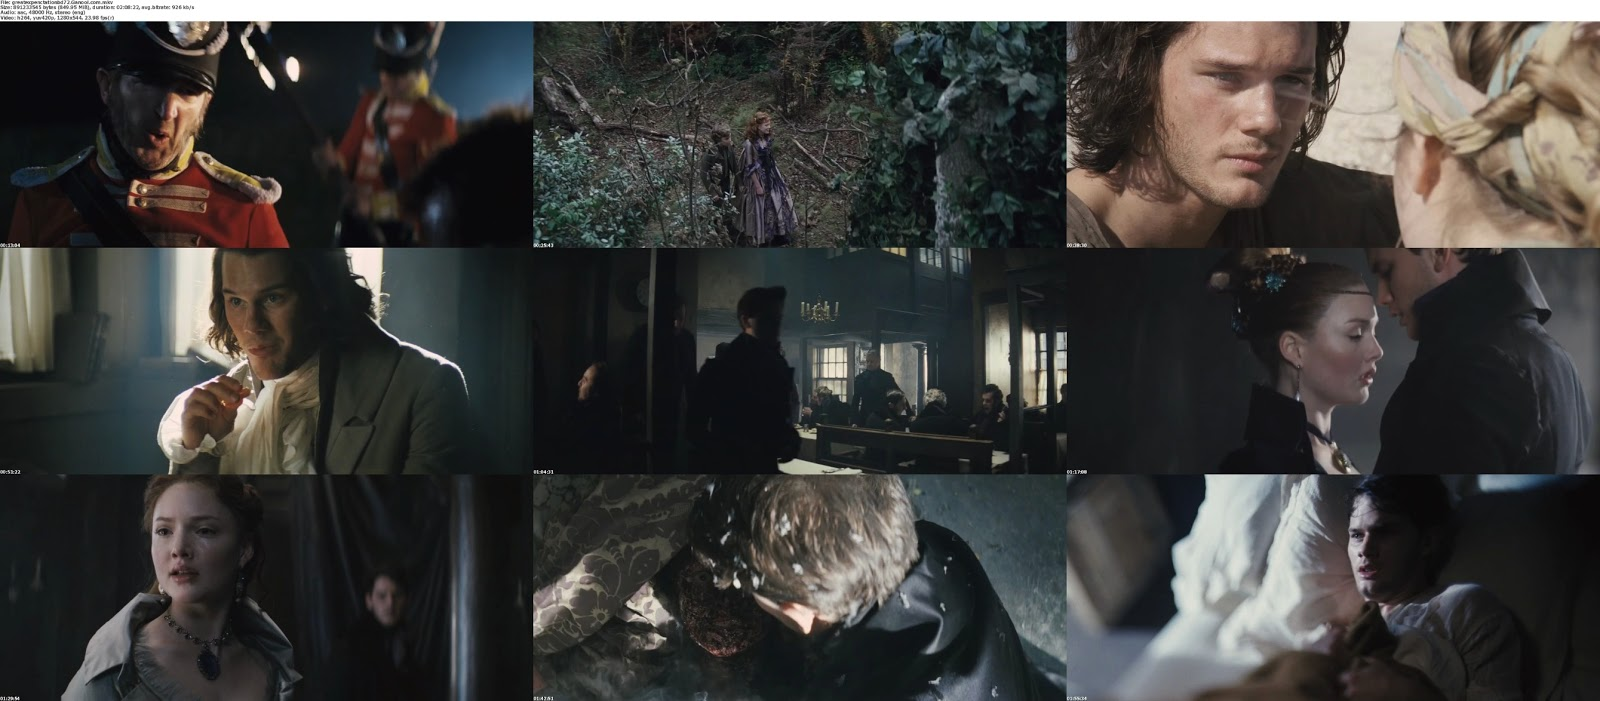 movie screenshot of Great Expectations fdmovie.com